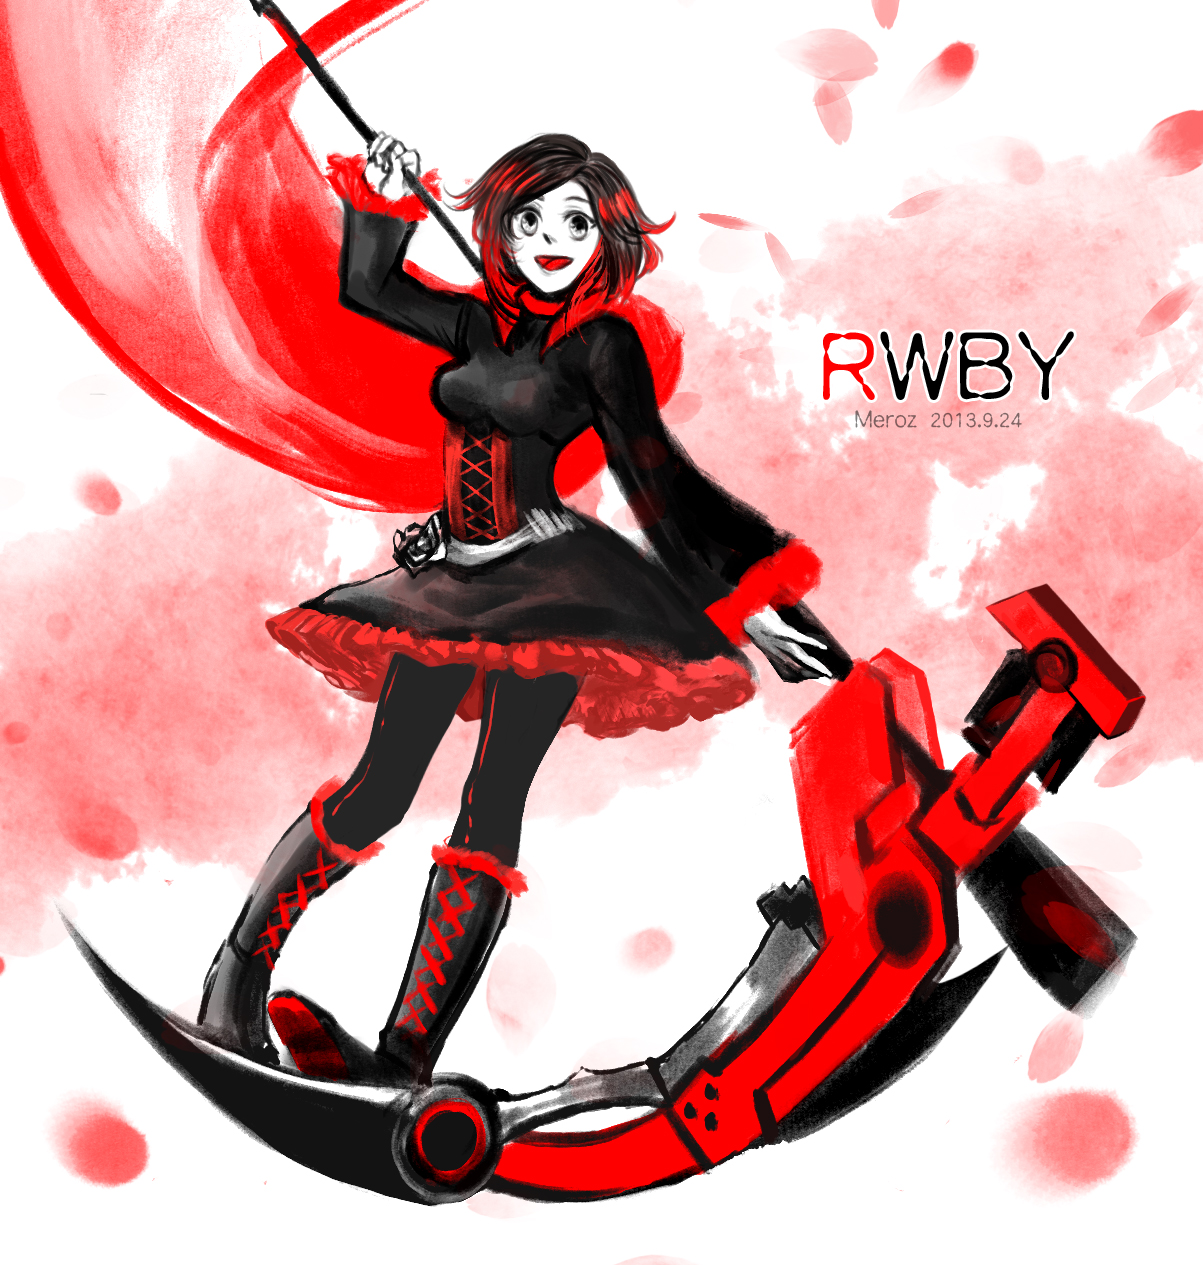 Rwby ruby rose by mengluoli on deviantart - Rwby ruby rose fanart ...